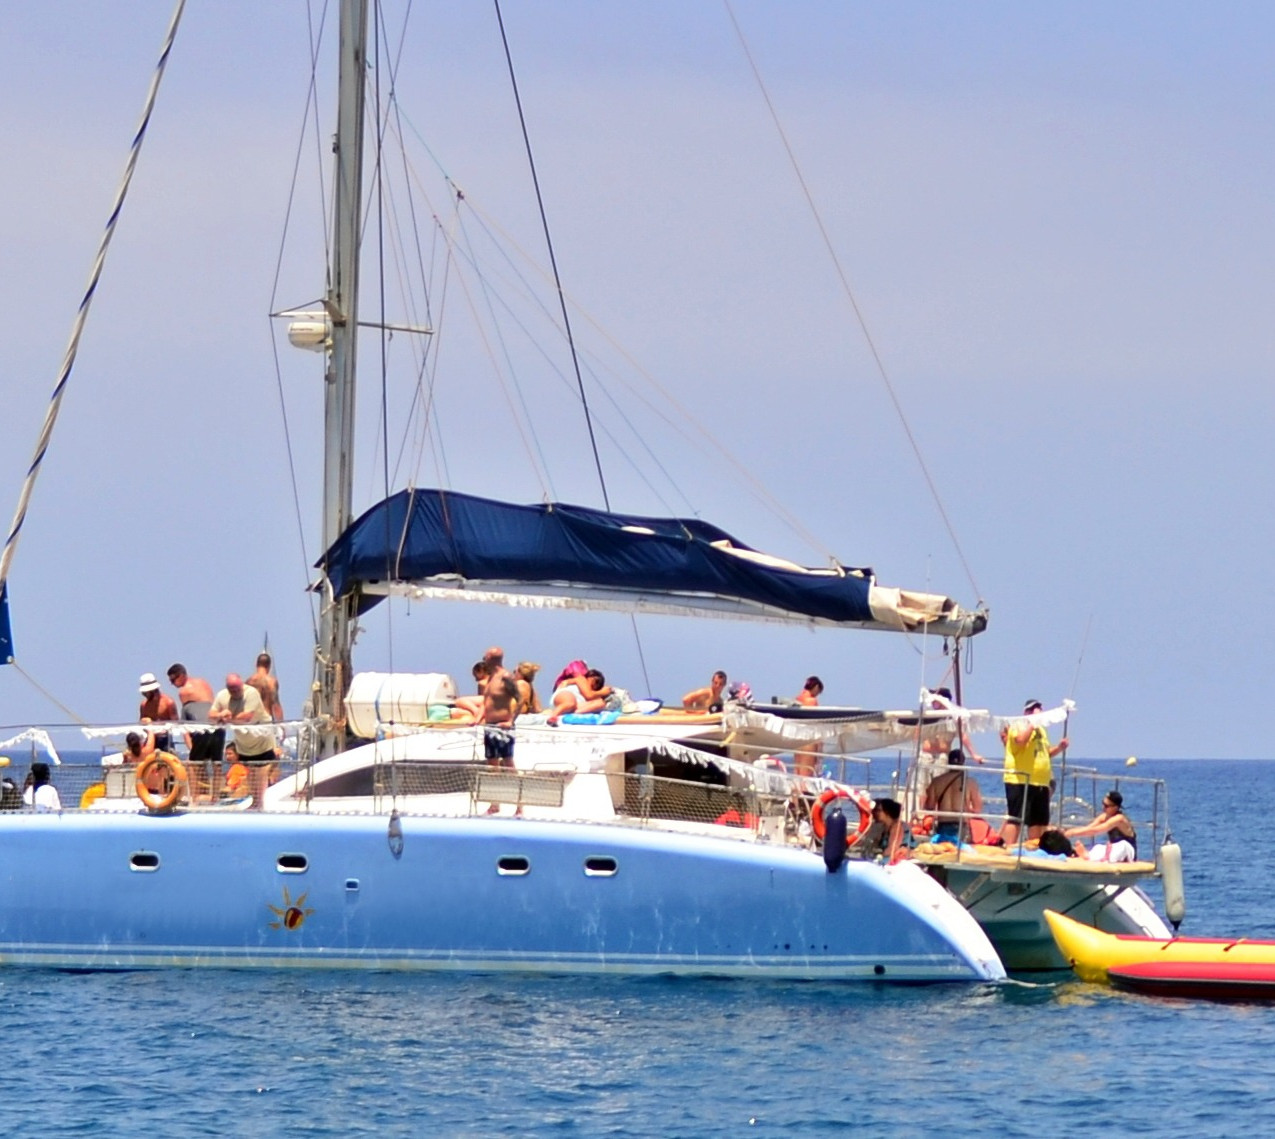 Catamaran pasaje, Max 50 pax